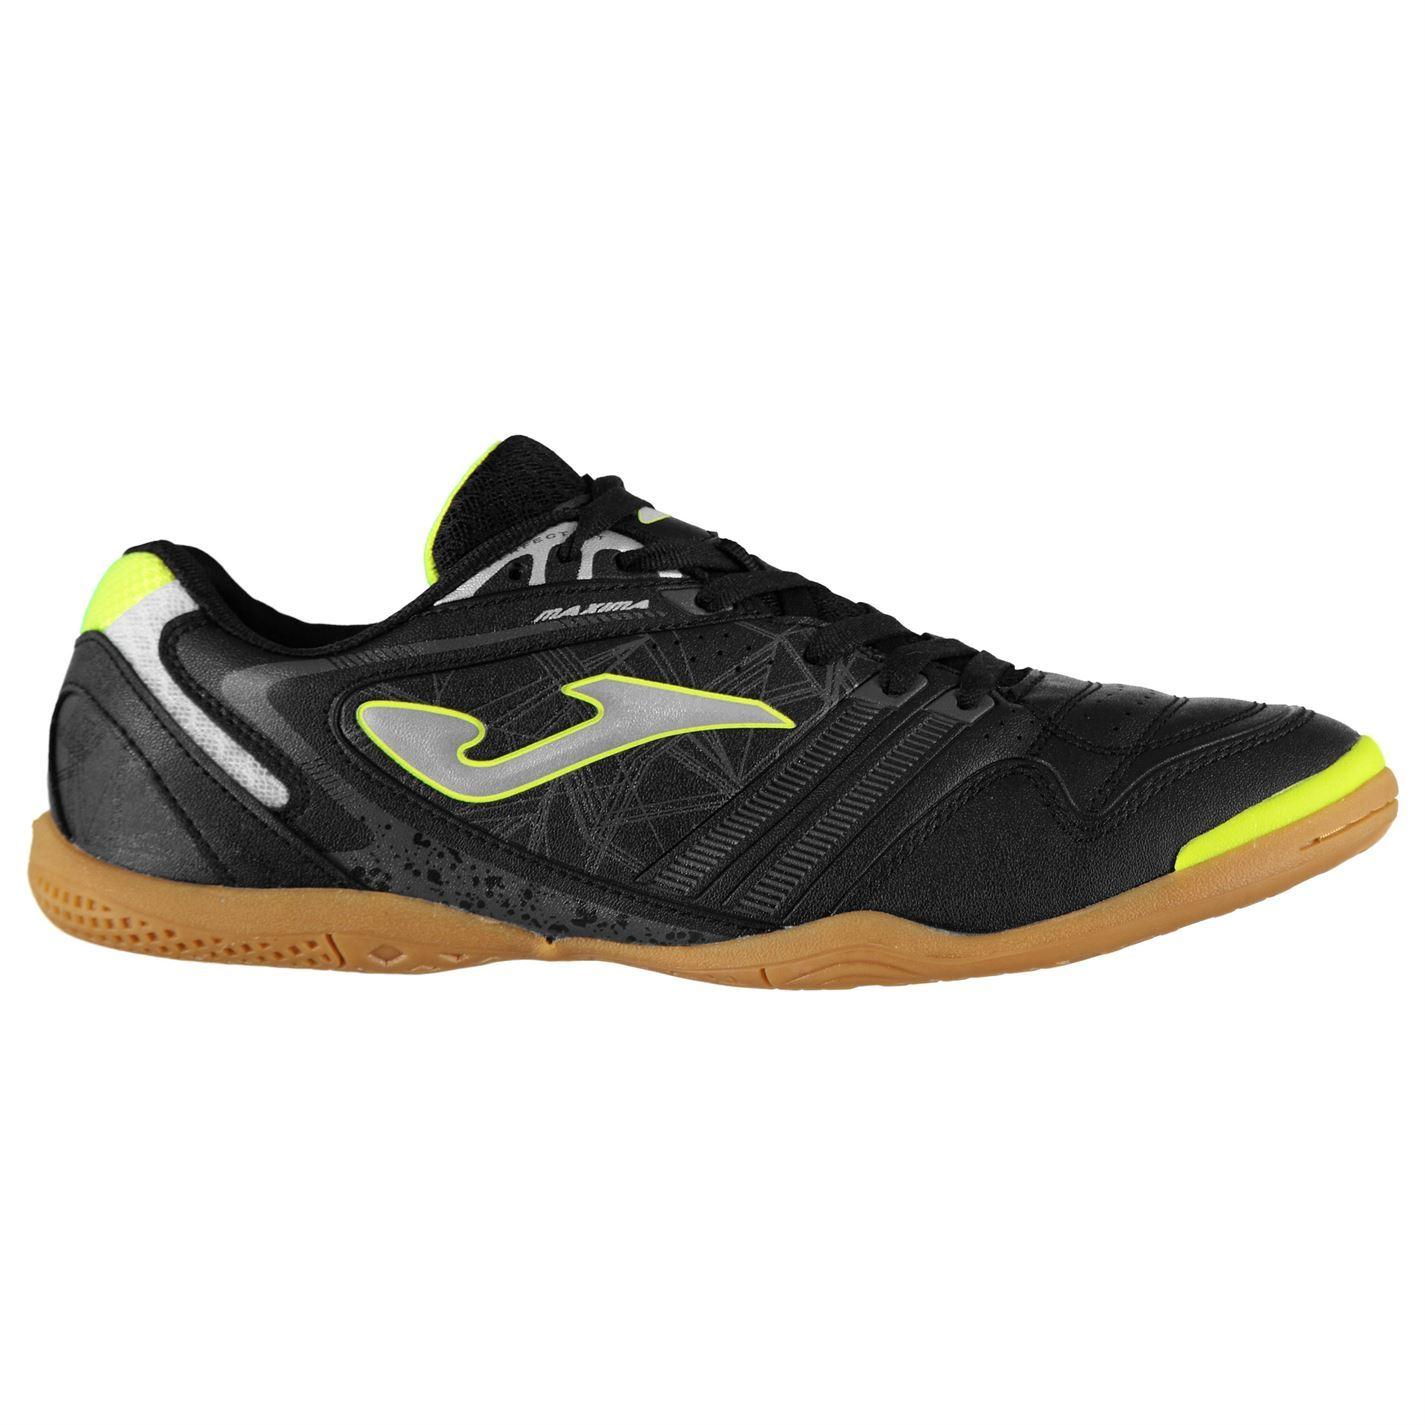 4c16354a09d Joma Maxima Indoor Football Trainers Mens Soccer Futsal Shoes ...